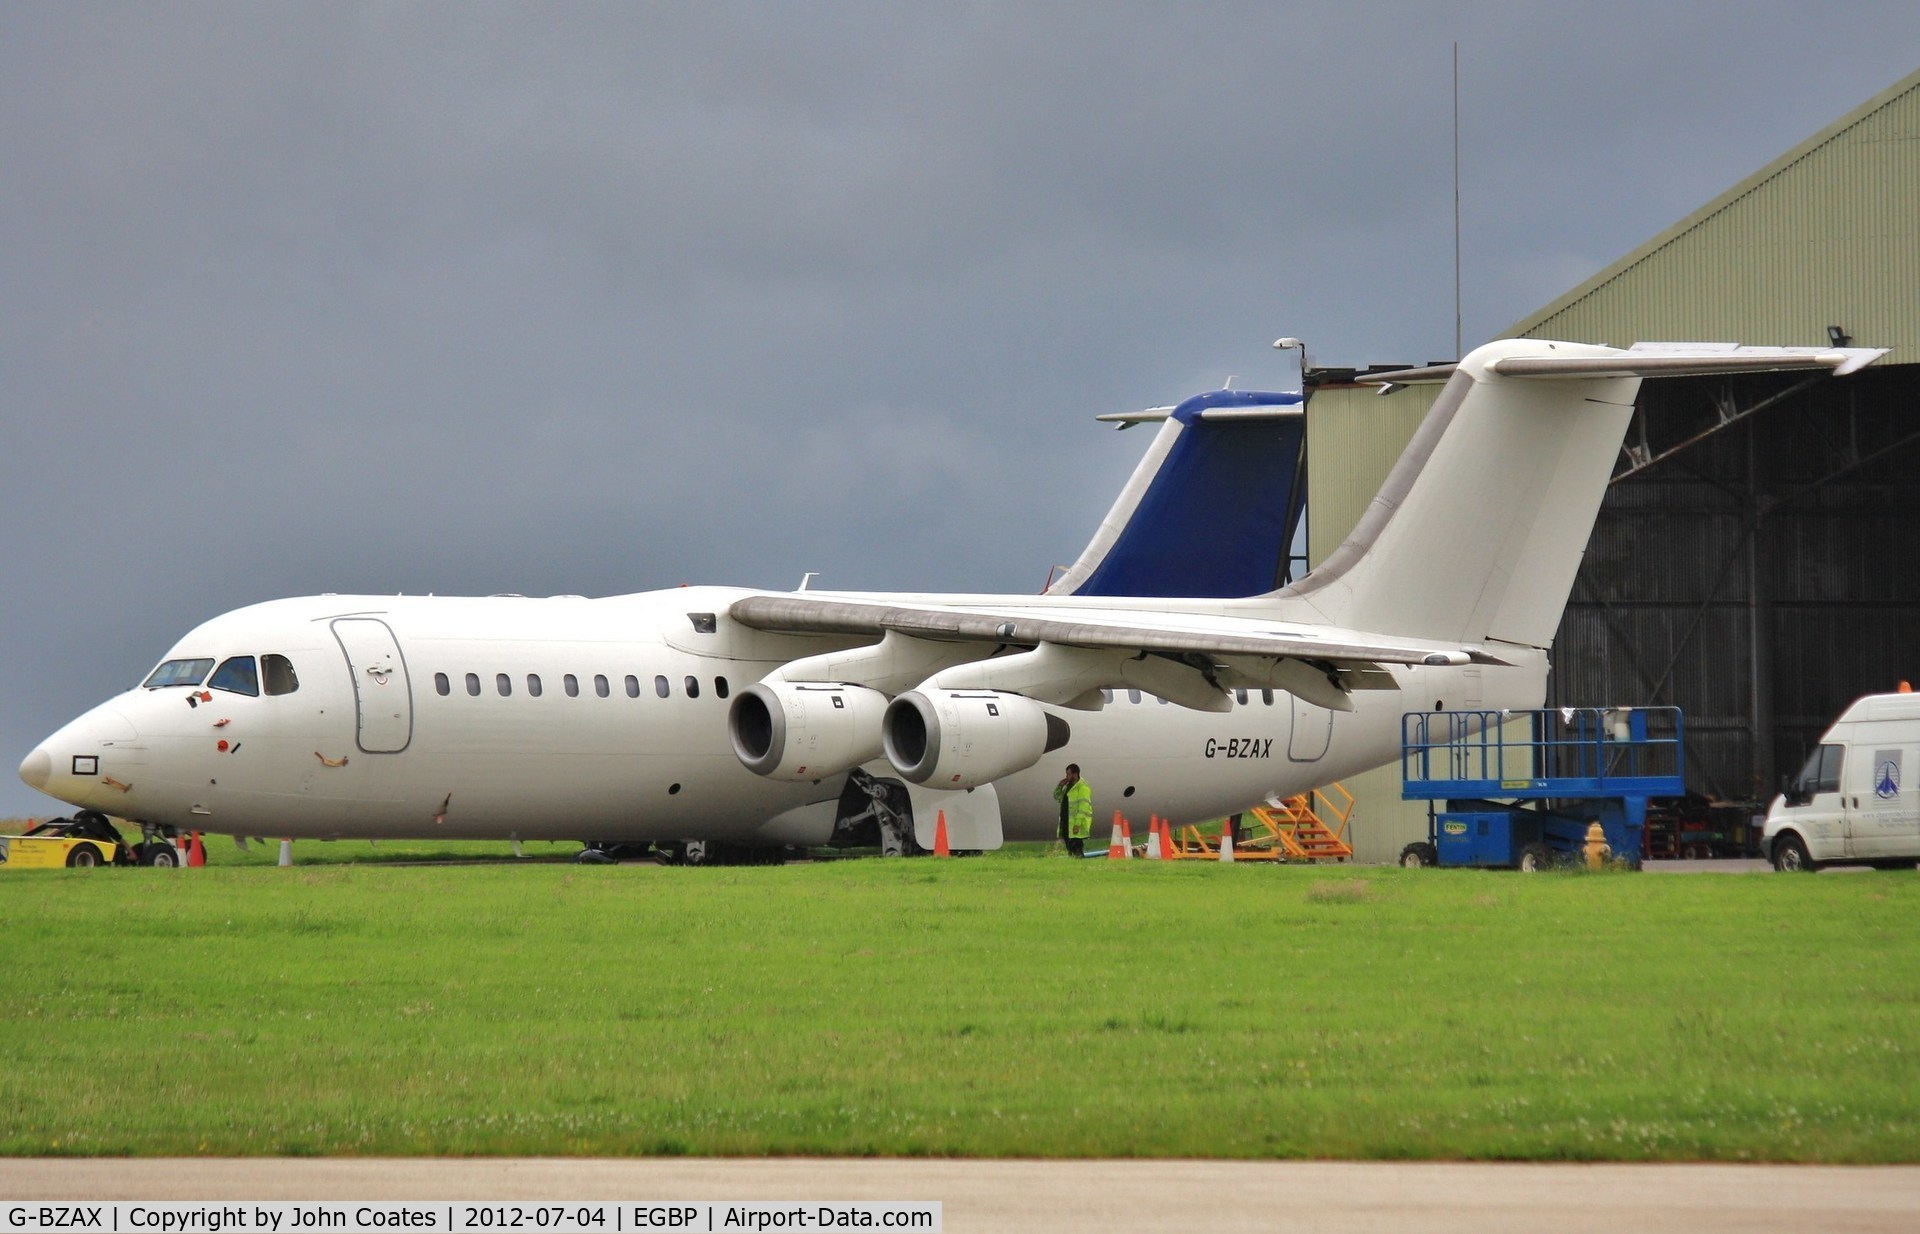 G-BZAX, 1999 British Aerospace Avro 146-RJ100 C/N E3356, Awaiting its future